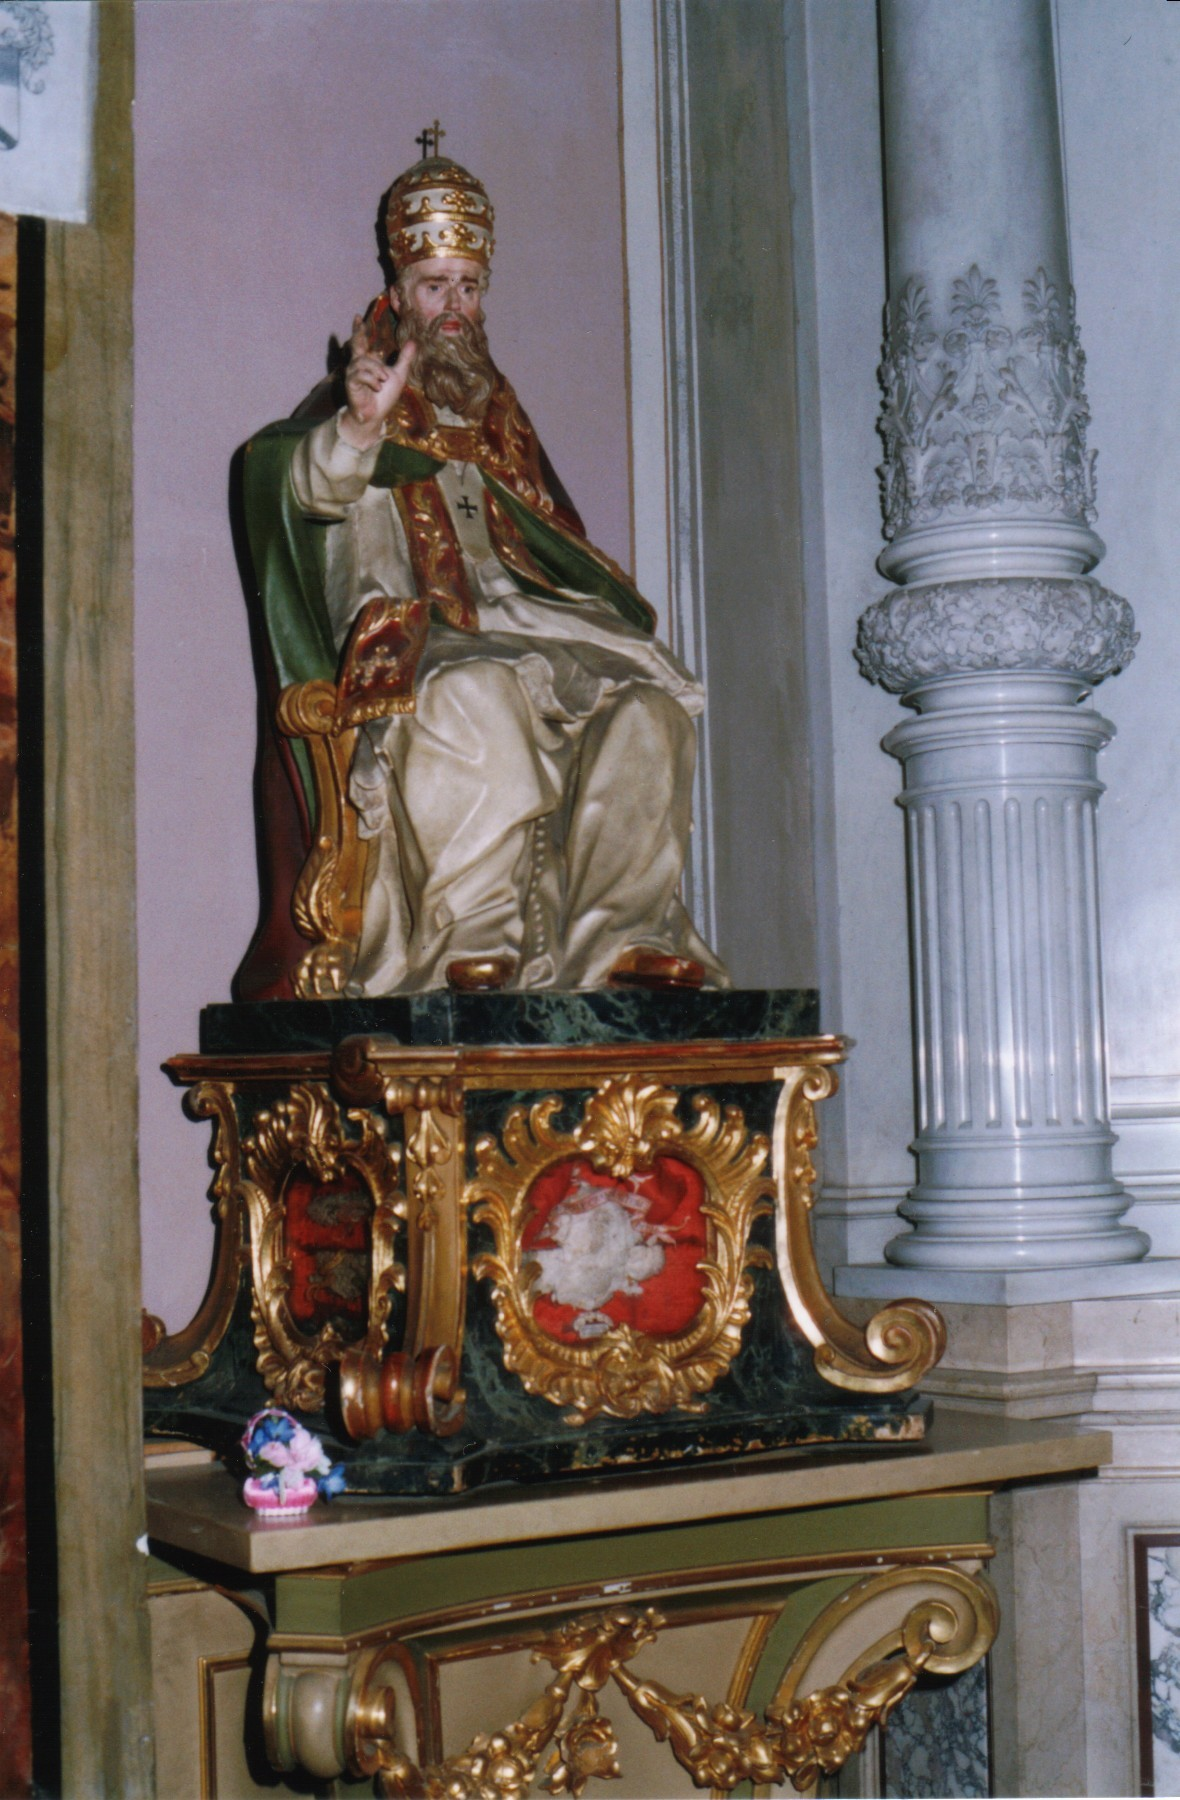 Sant'Antero Papa – Festeggiamenti sabato 27 giugno 2015